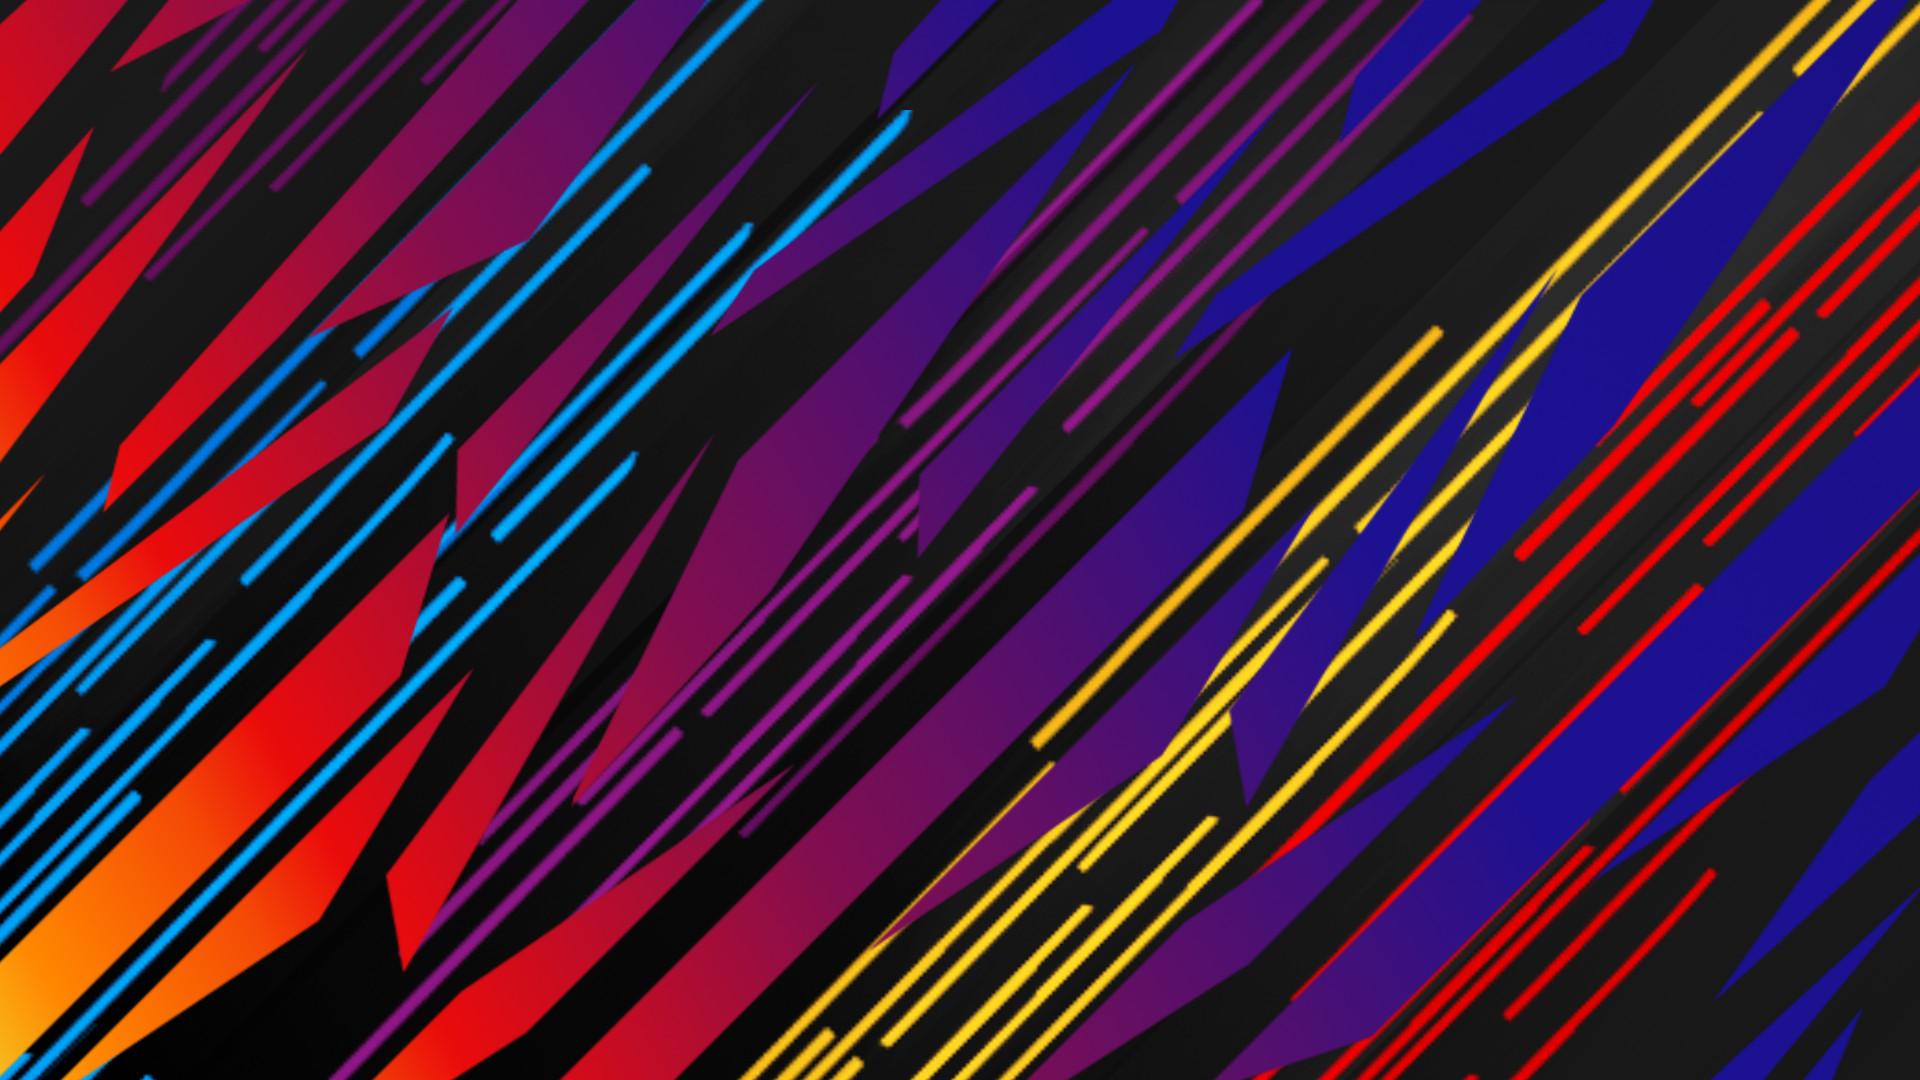 Bob S Burgers Background Designs